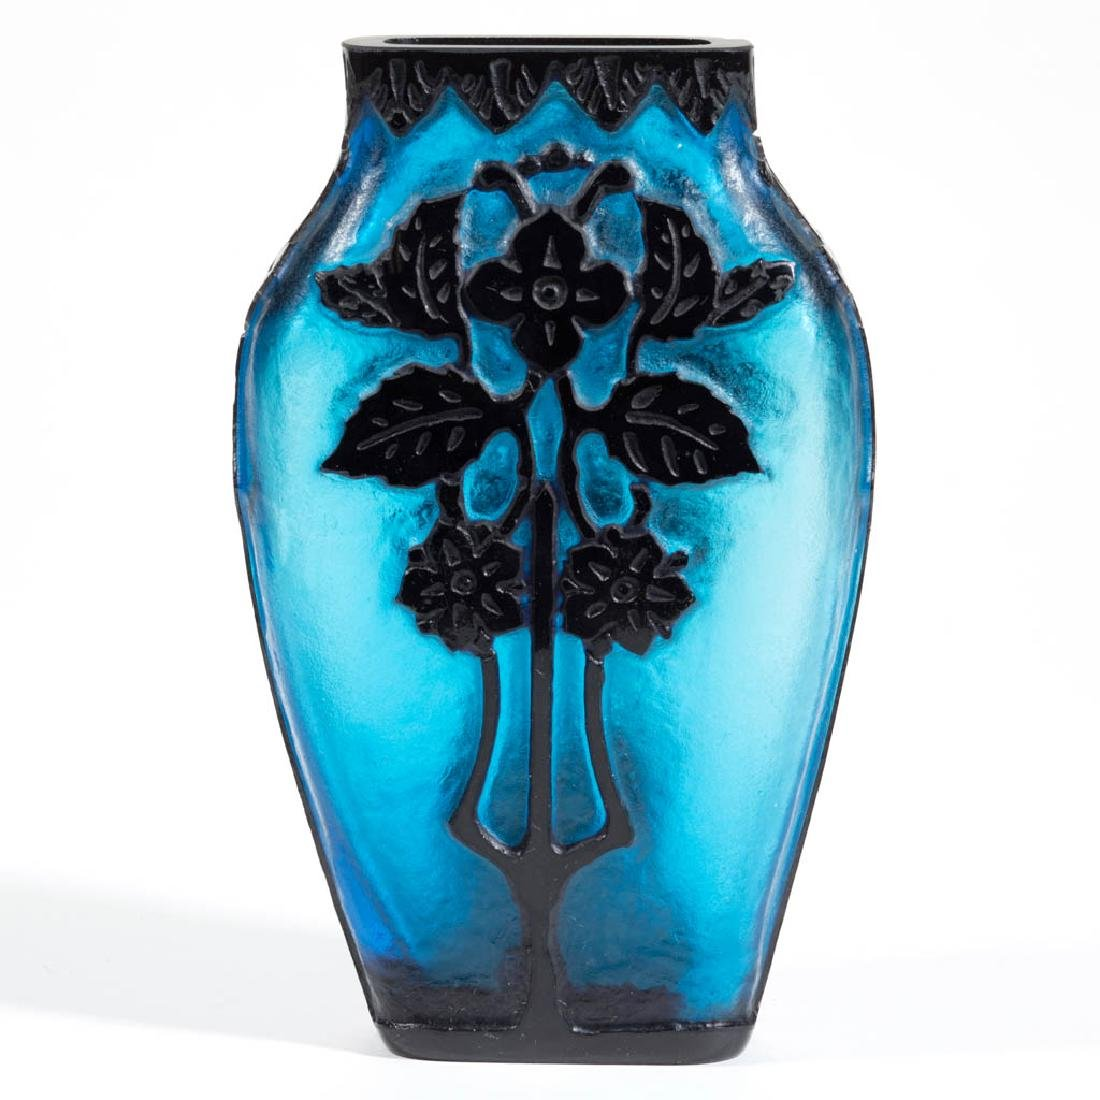 STEUBEN ACID-CUTBACK / CAMEO ART GLASS VASE